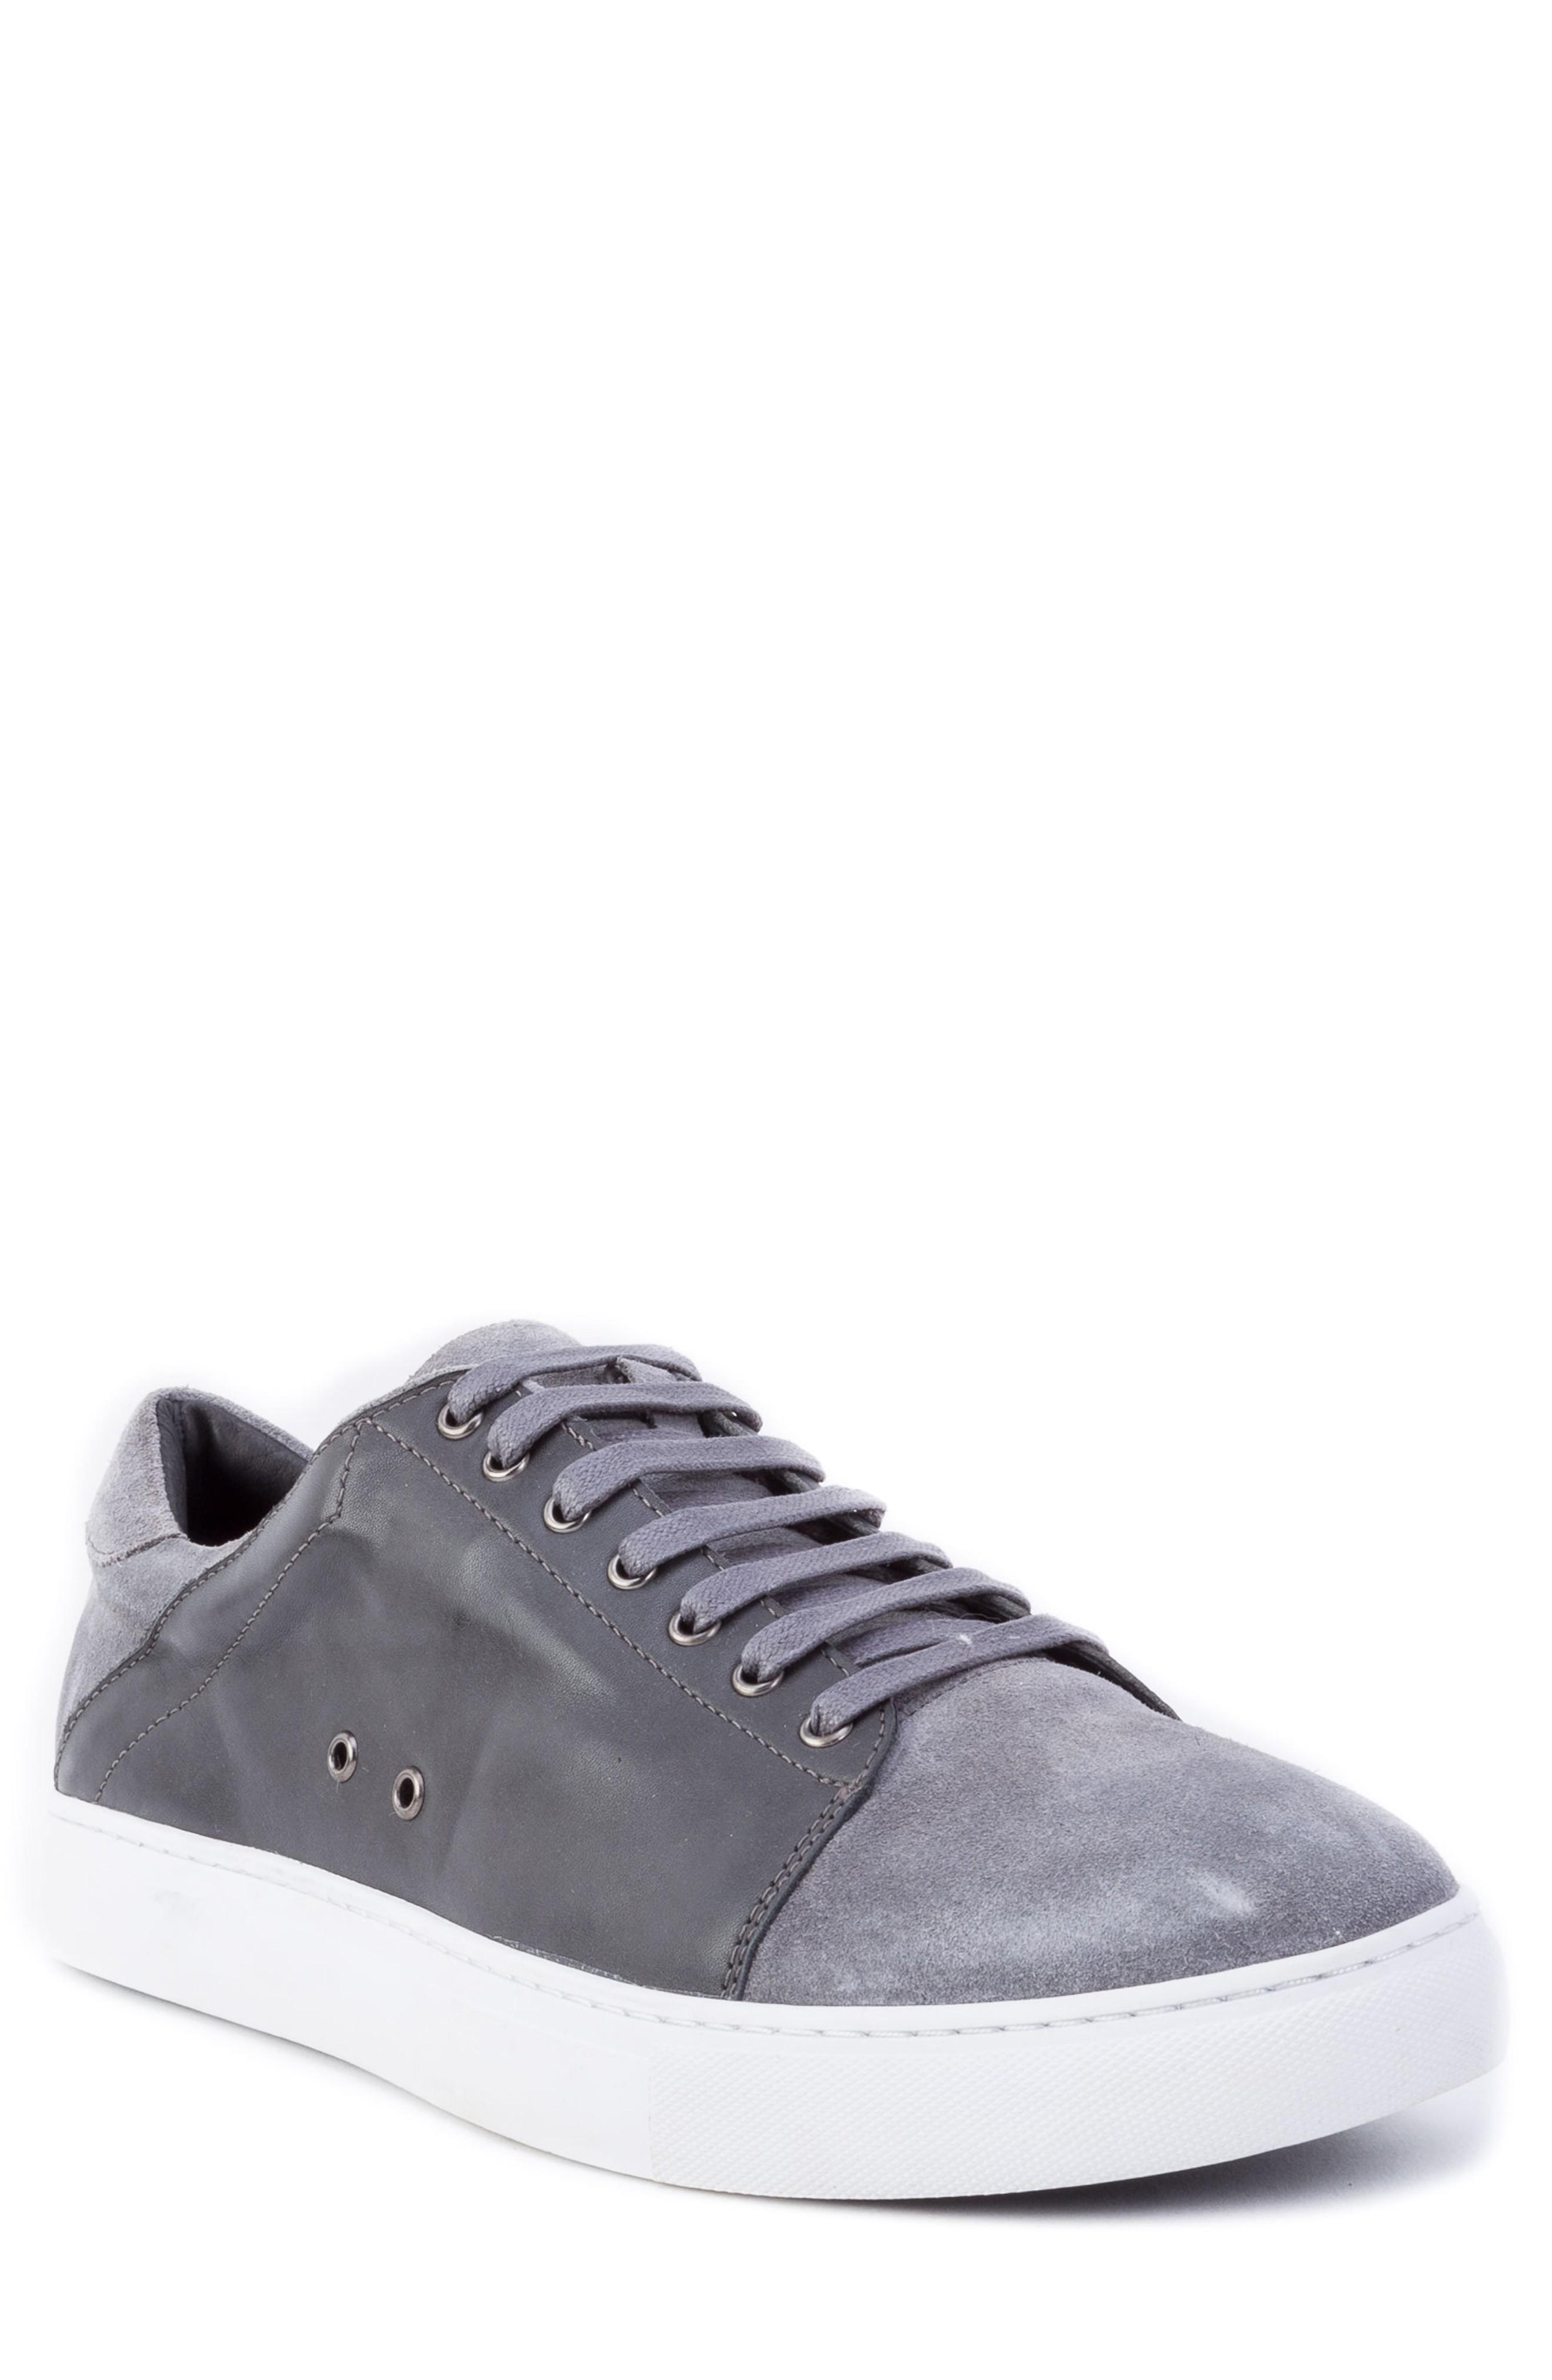 Zanzara Record Low Top Sneaker In Grey Suede/ Leather